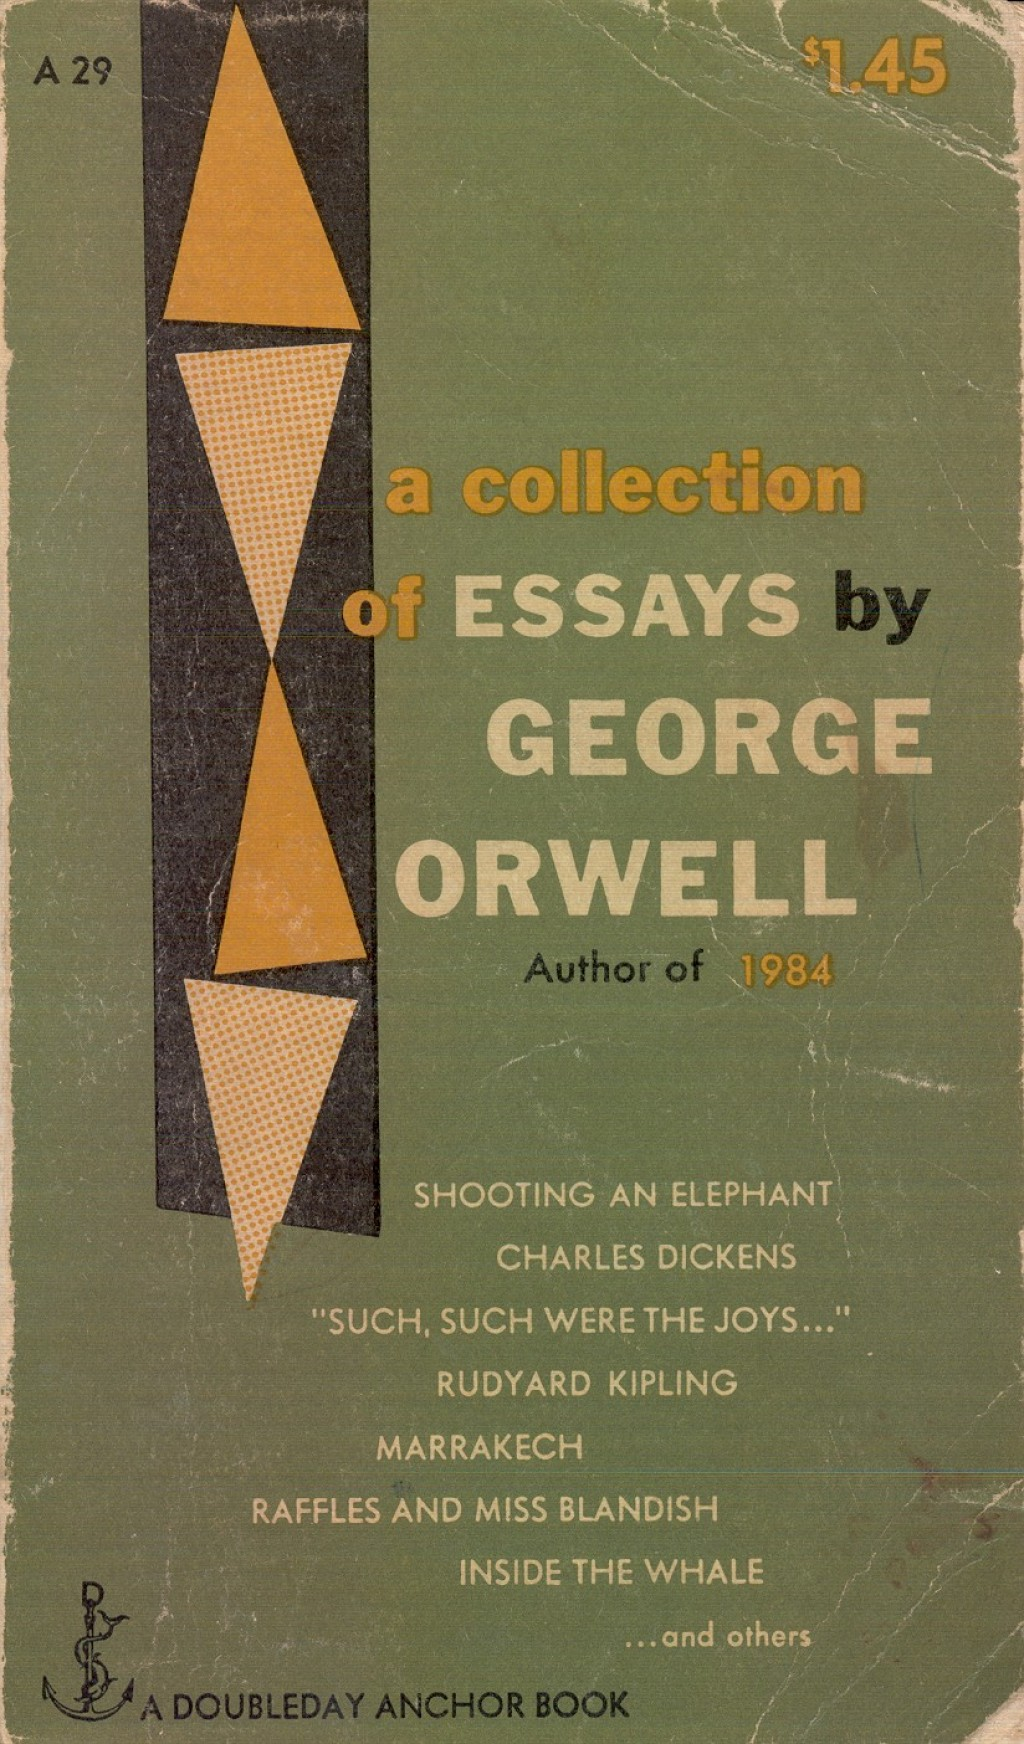 019 Essay Example Orwell George Frightening Essays Everyman's Library Summary Bookshop Memories Large